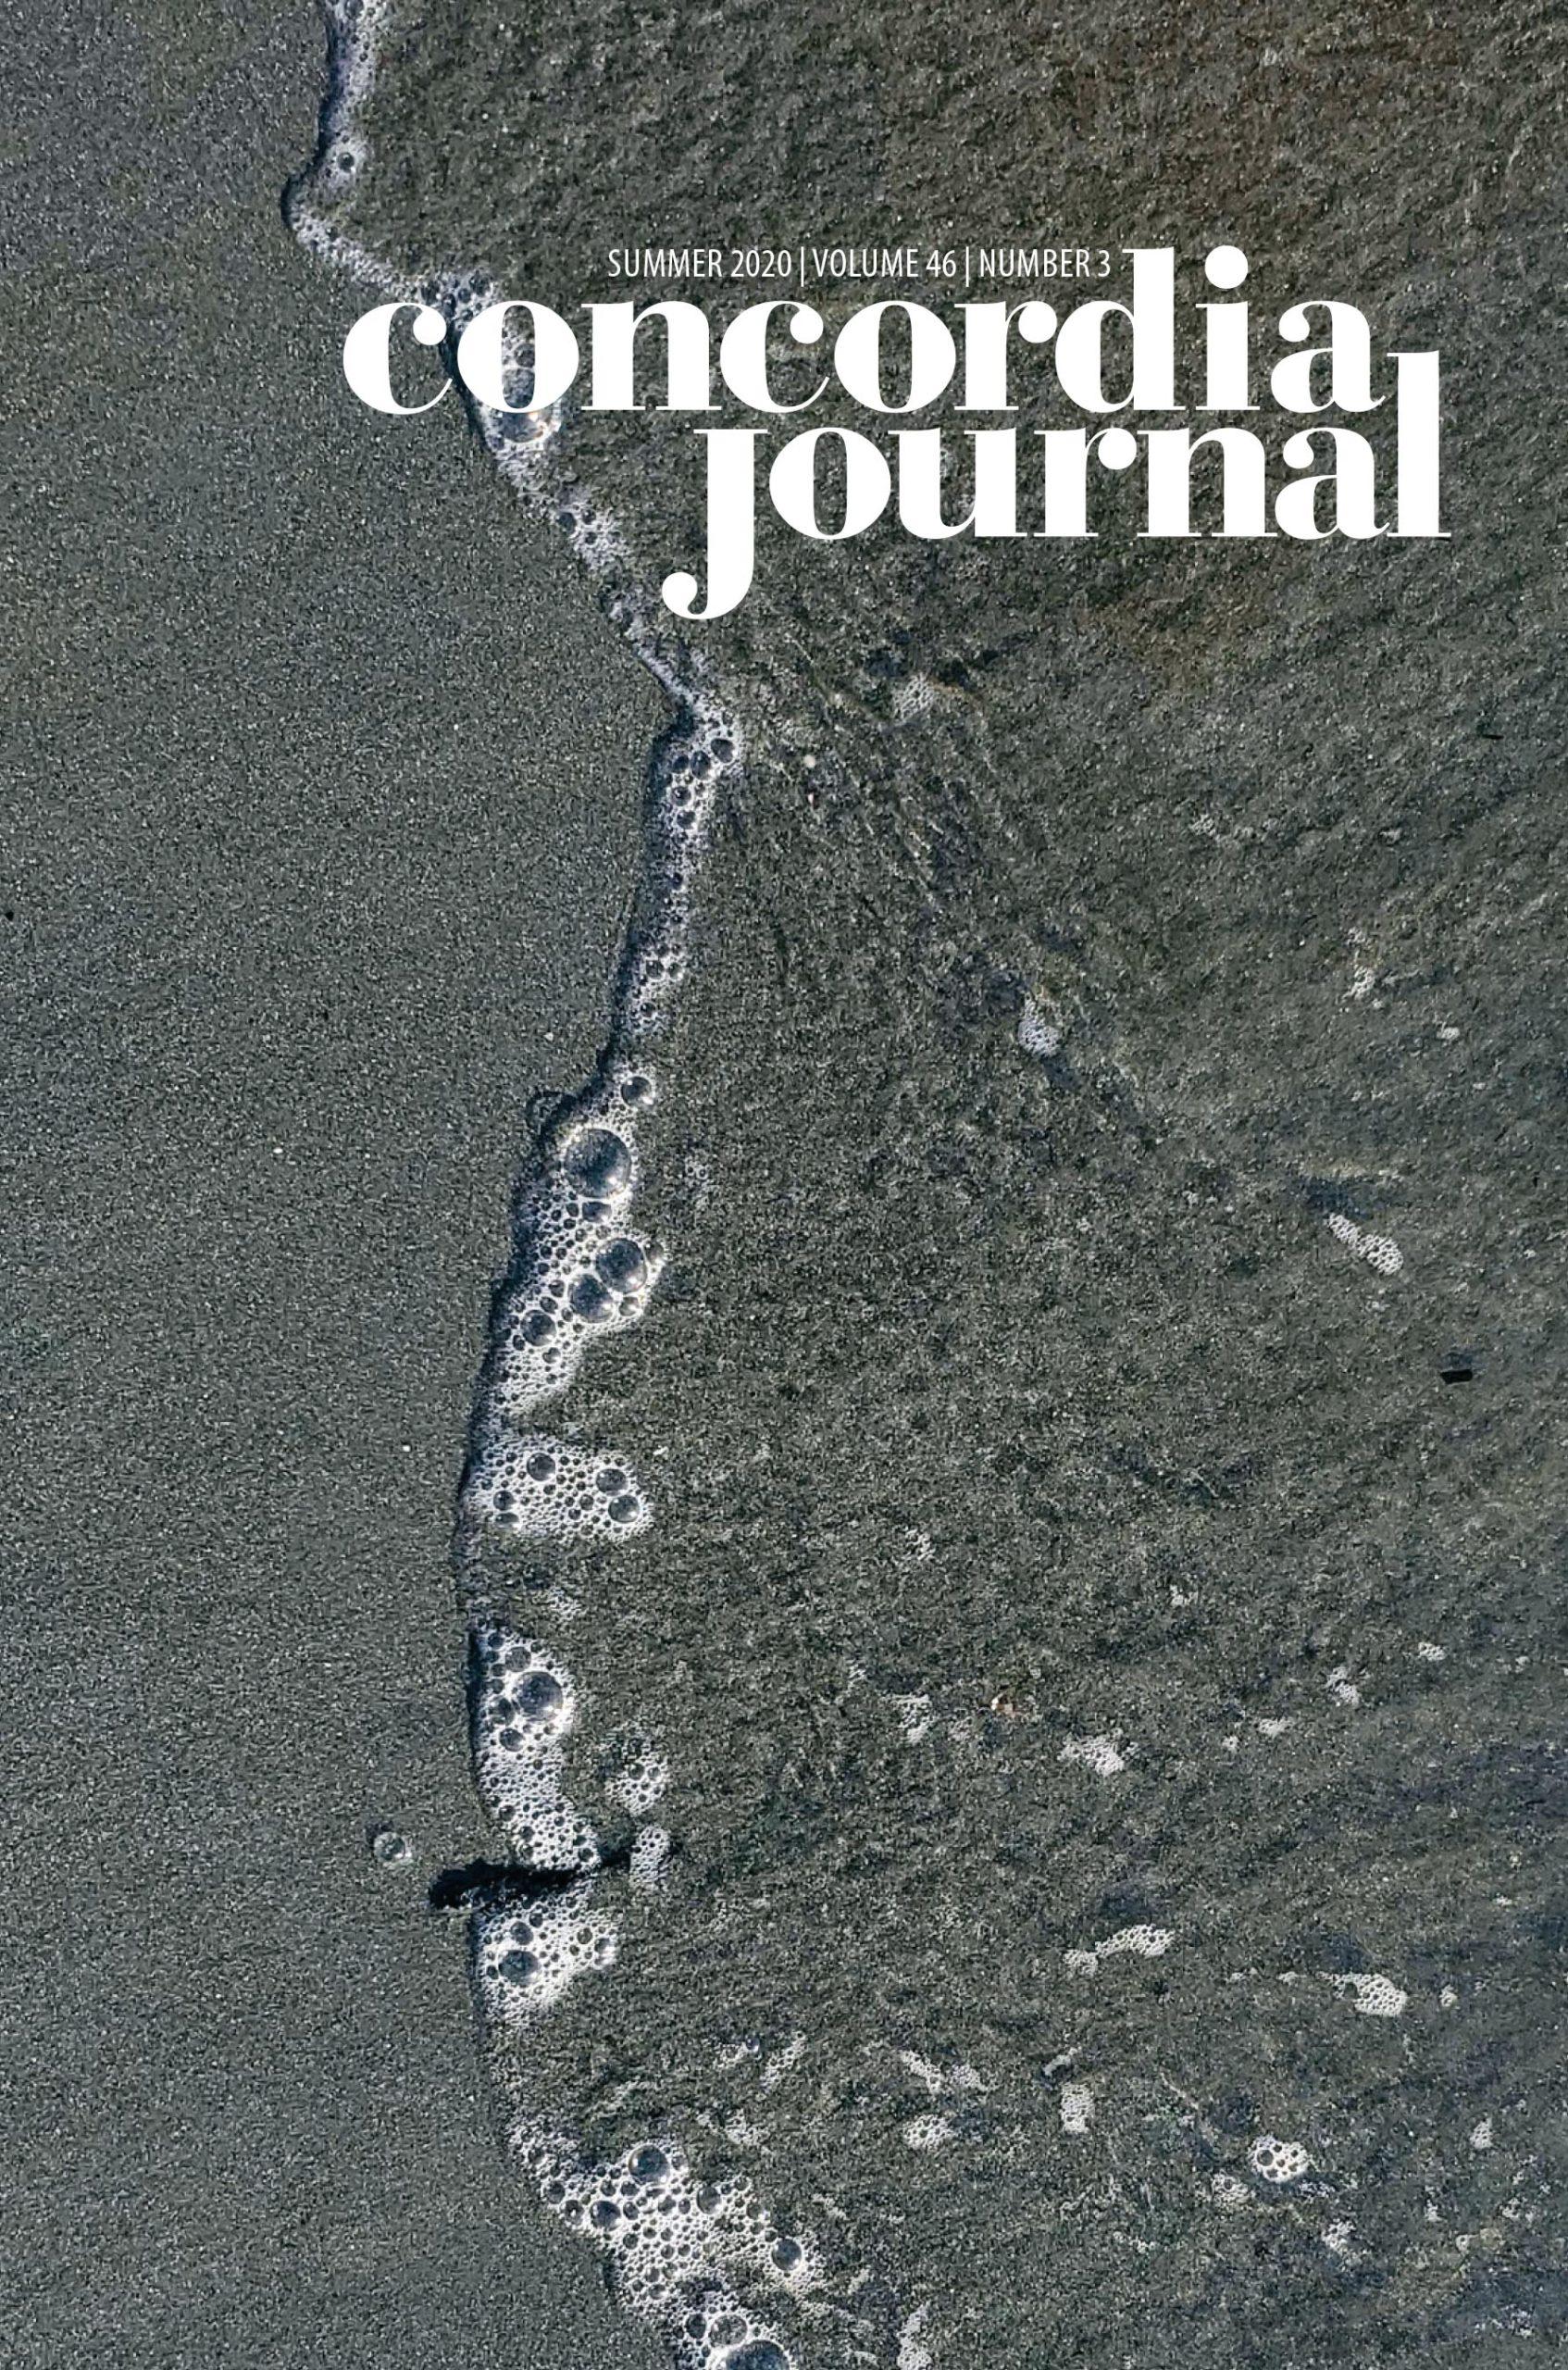 Concordia Journal, Summer 2020